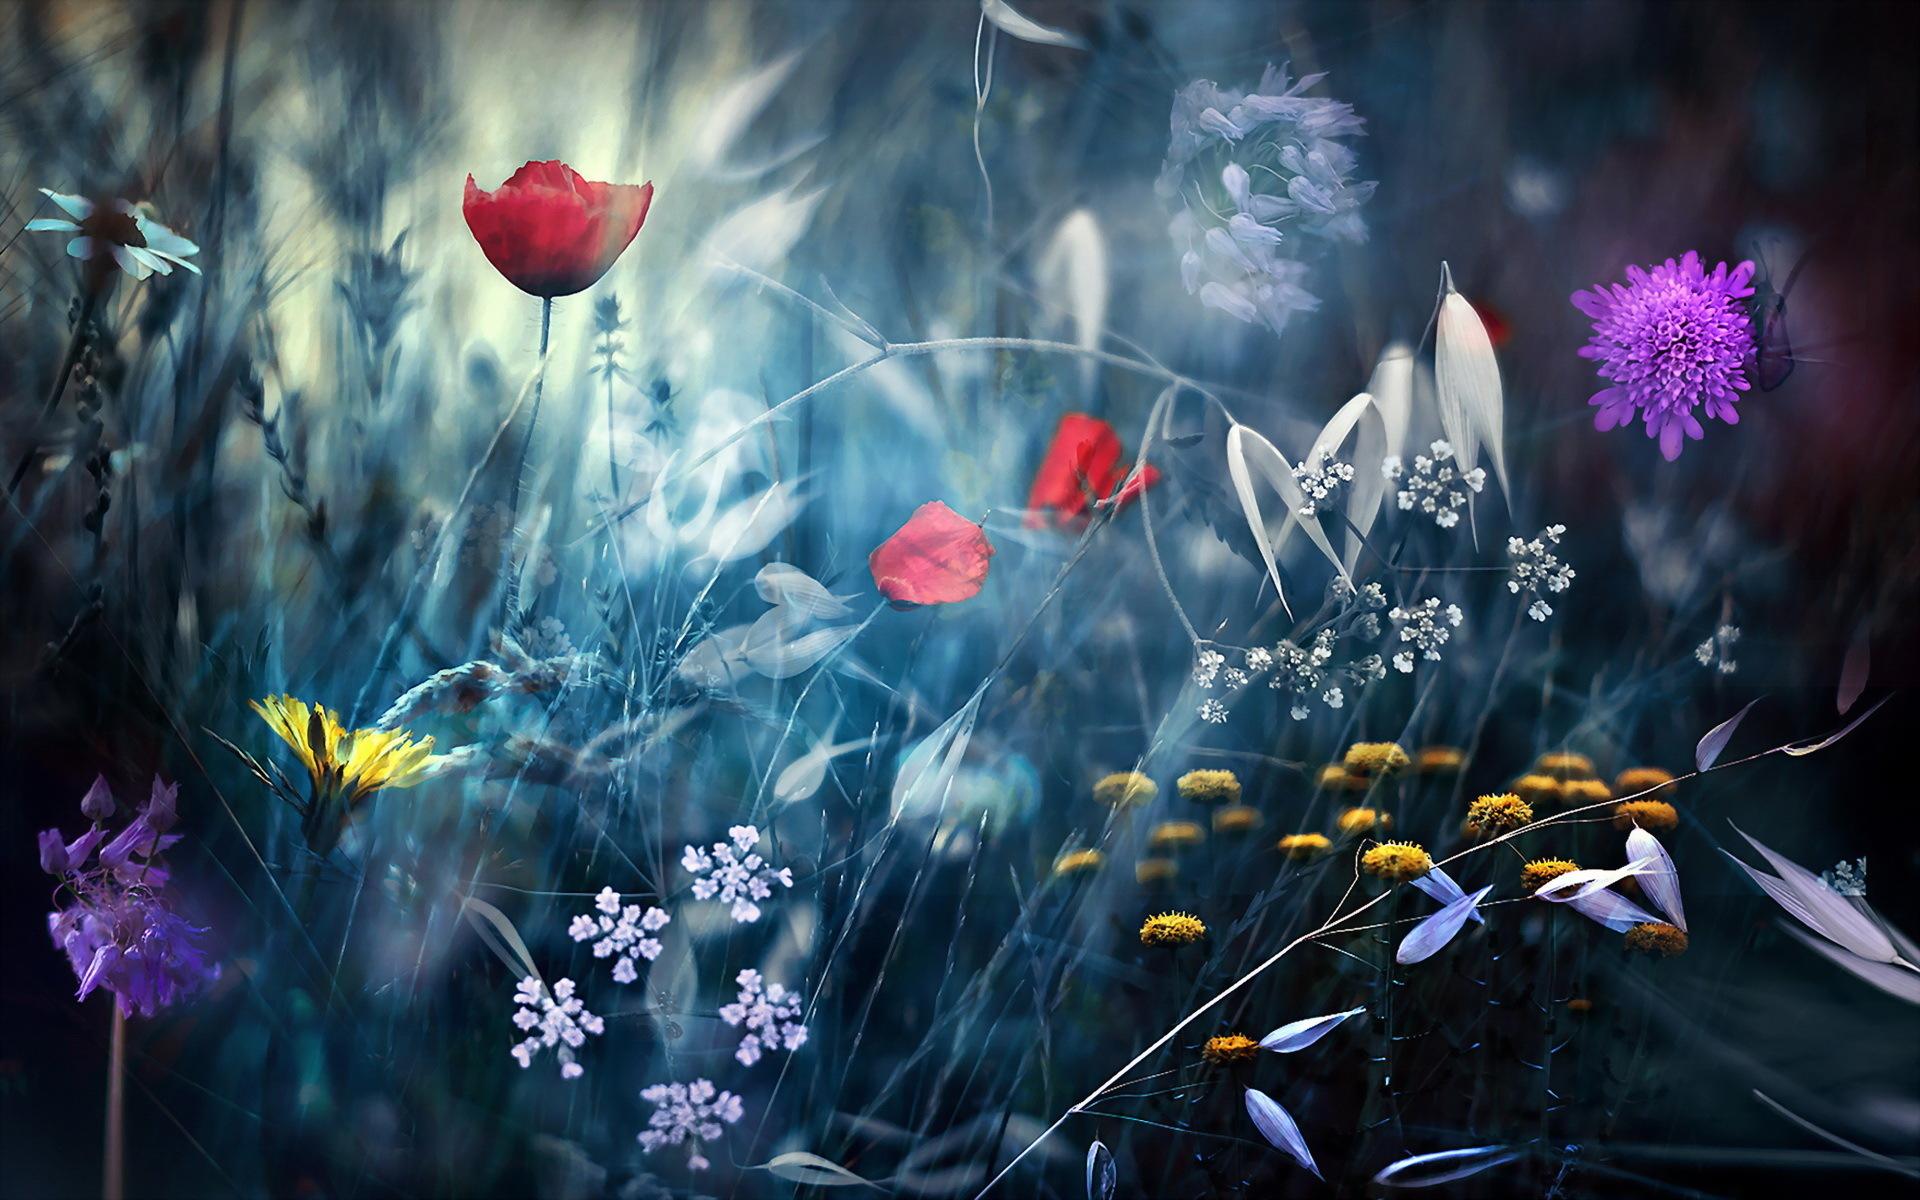 Niagara Falls Wallpaper Nature Different Flowers Hd Desktop Wallpapers 4k Hd